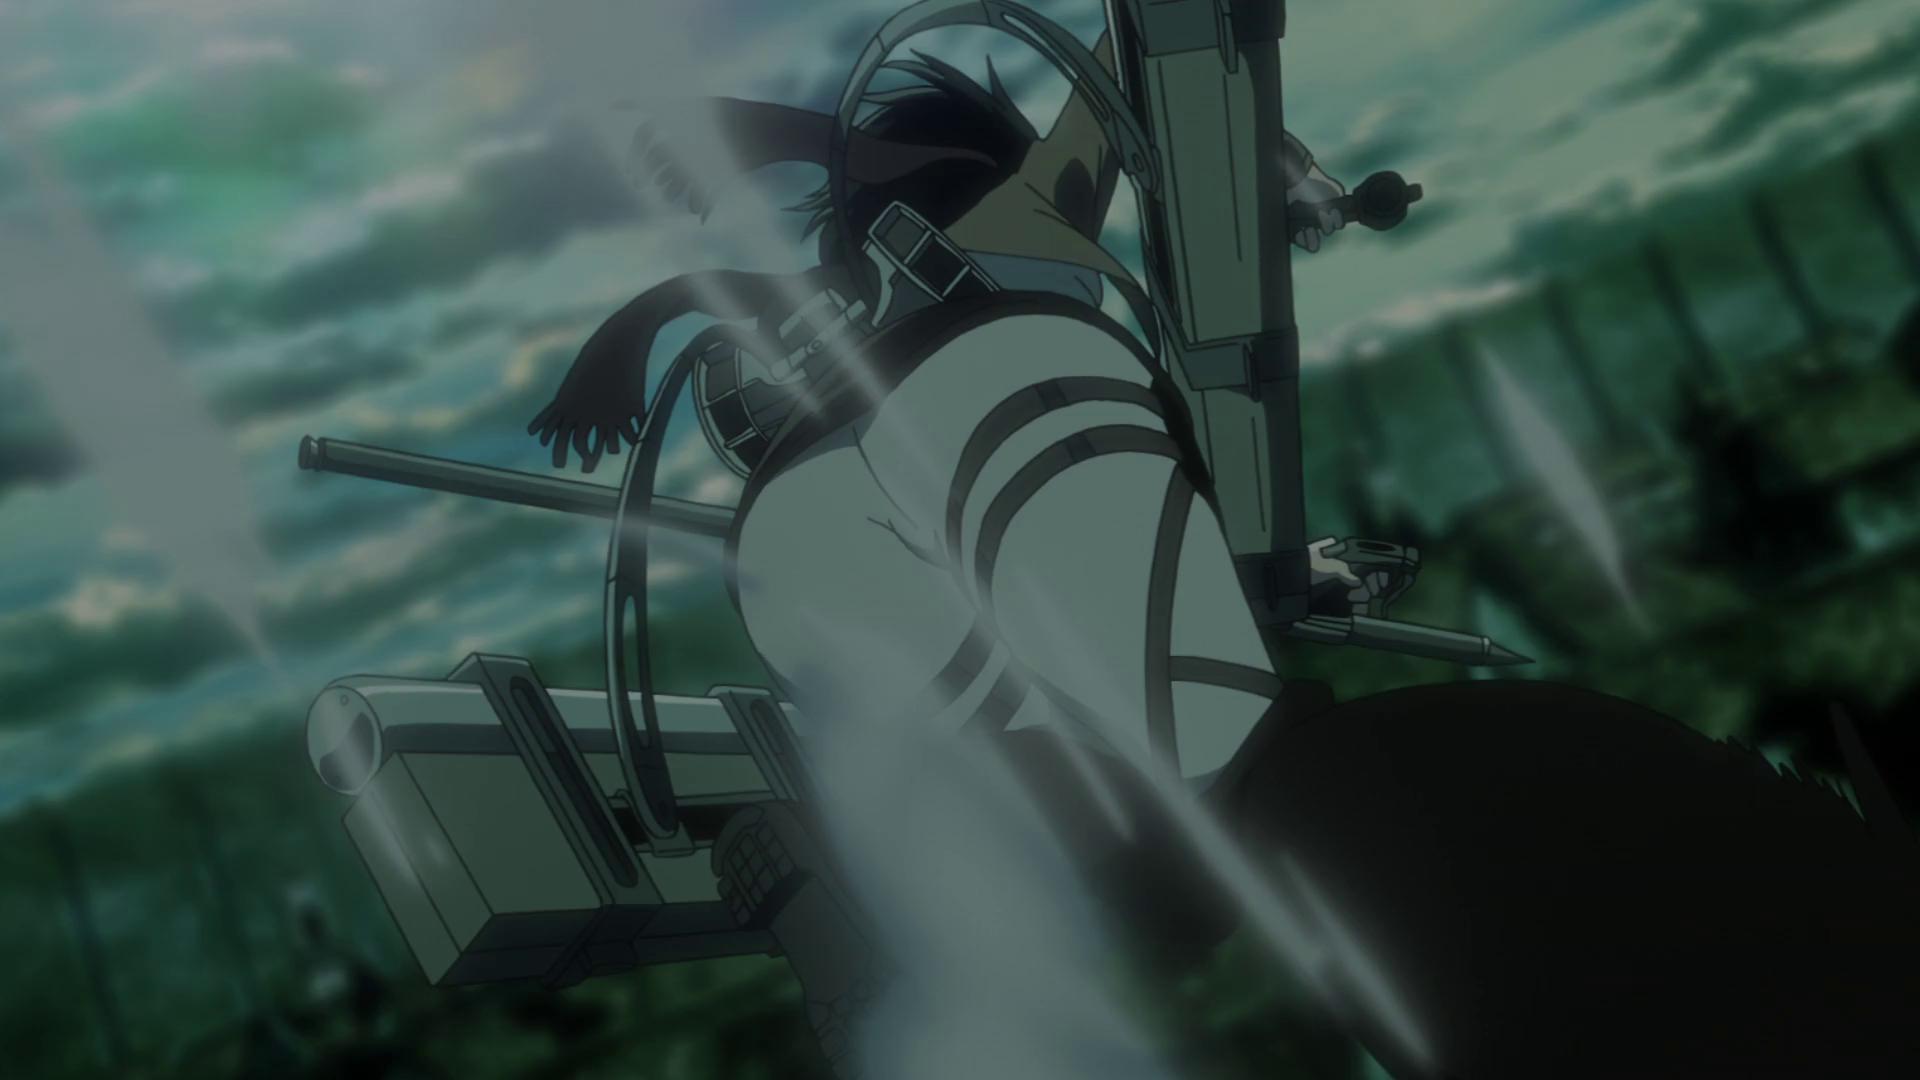 Shingeki no Kyojin Season 3 Part 2 Episode 3 Discussion - Forums